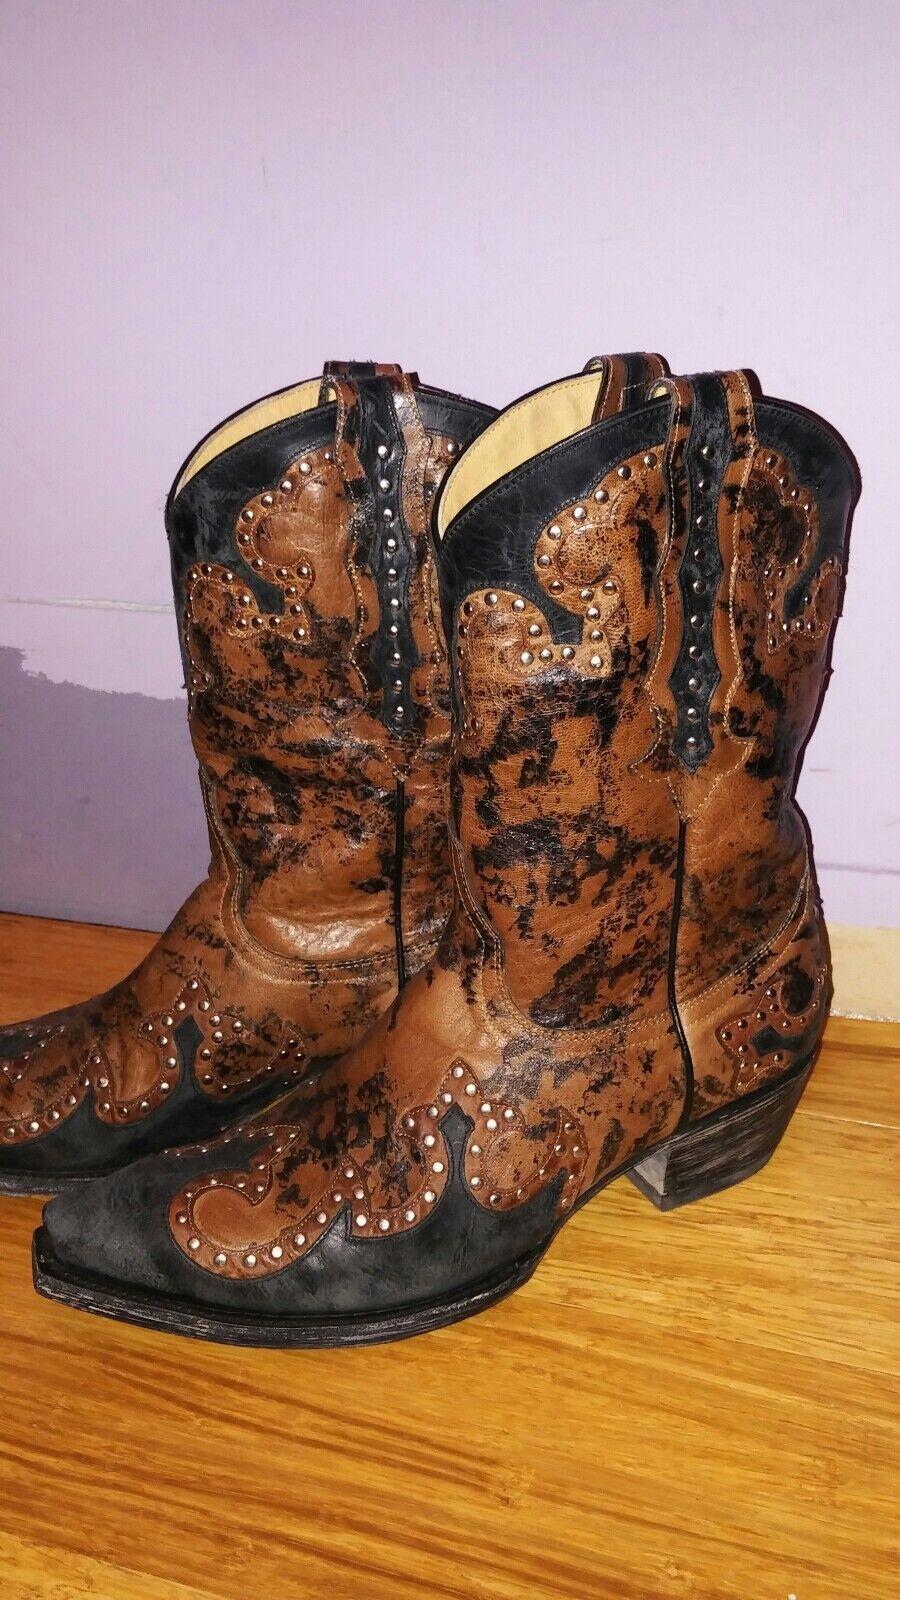 Old gringo ranger yippee ki yay camo studded bottes 9.5 leather cowboy cowgirl